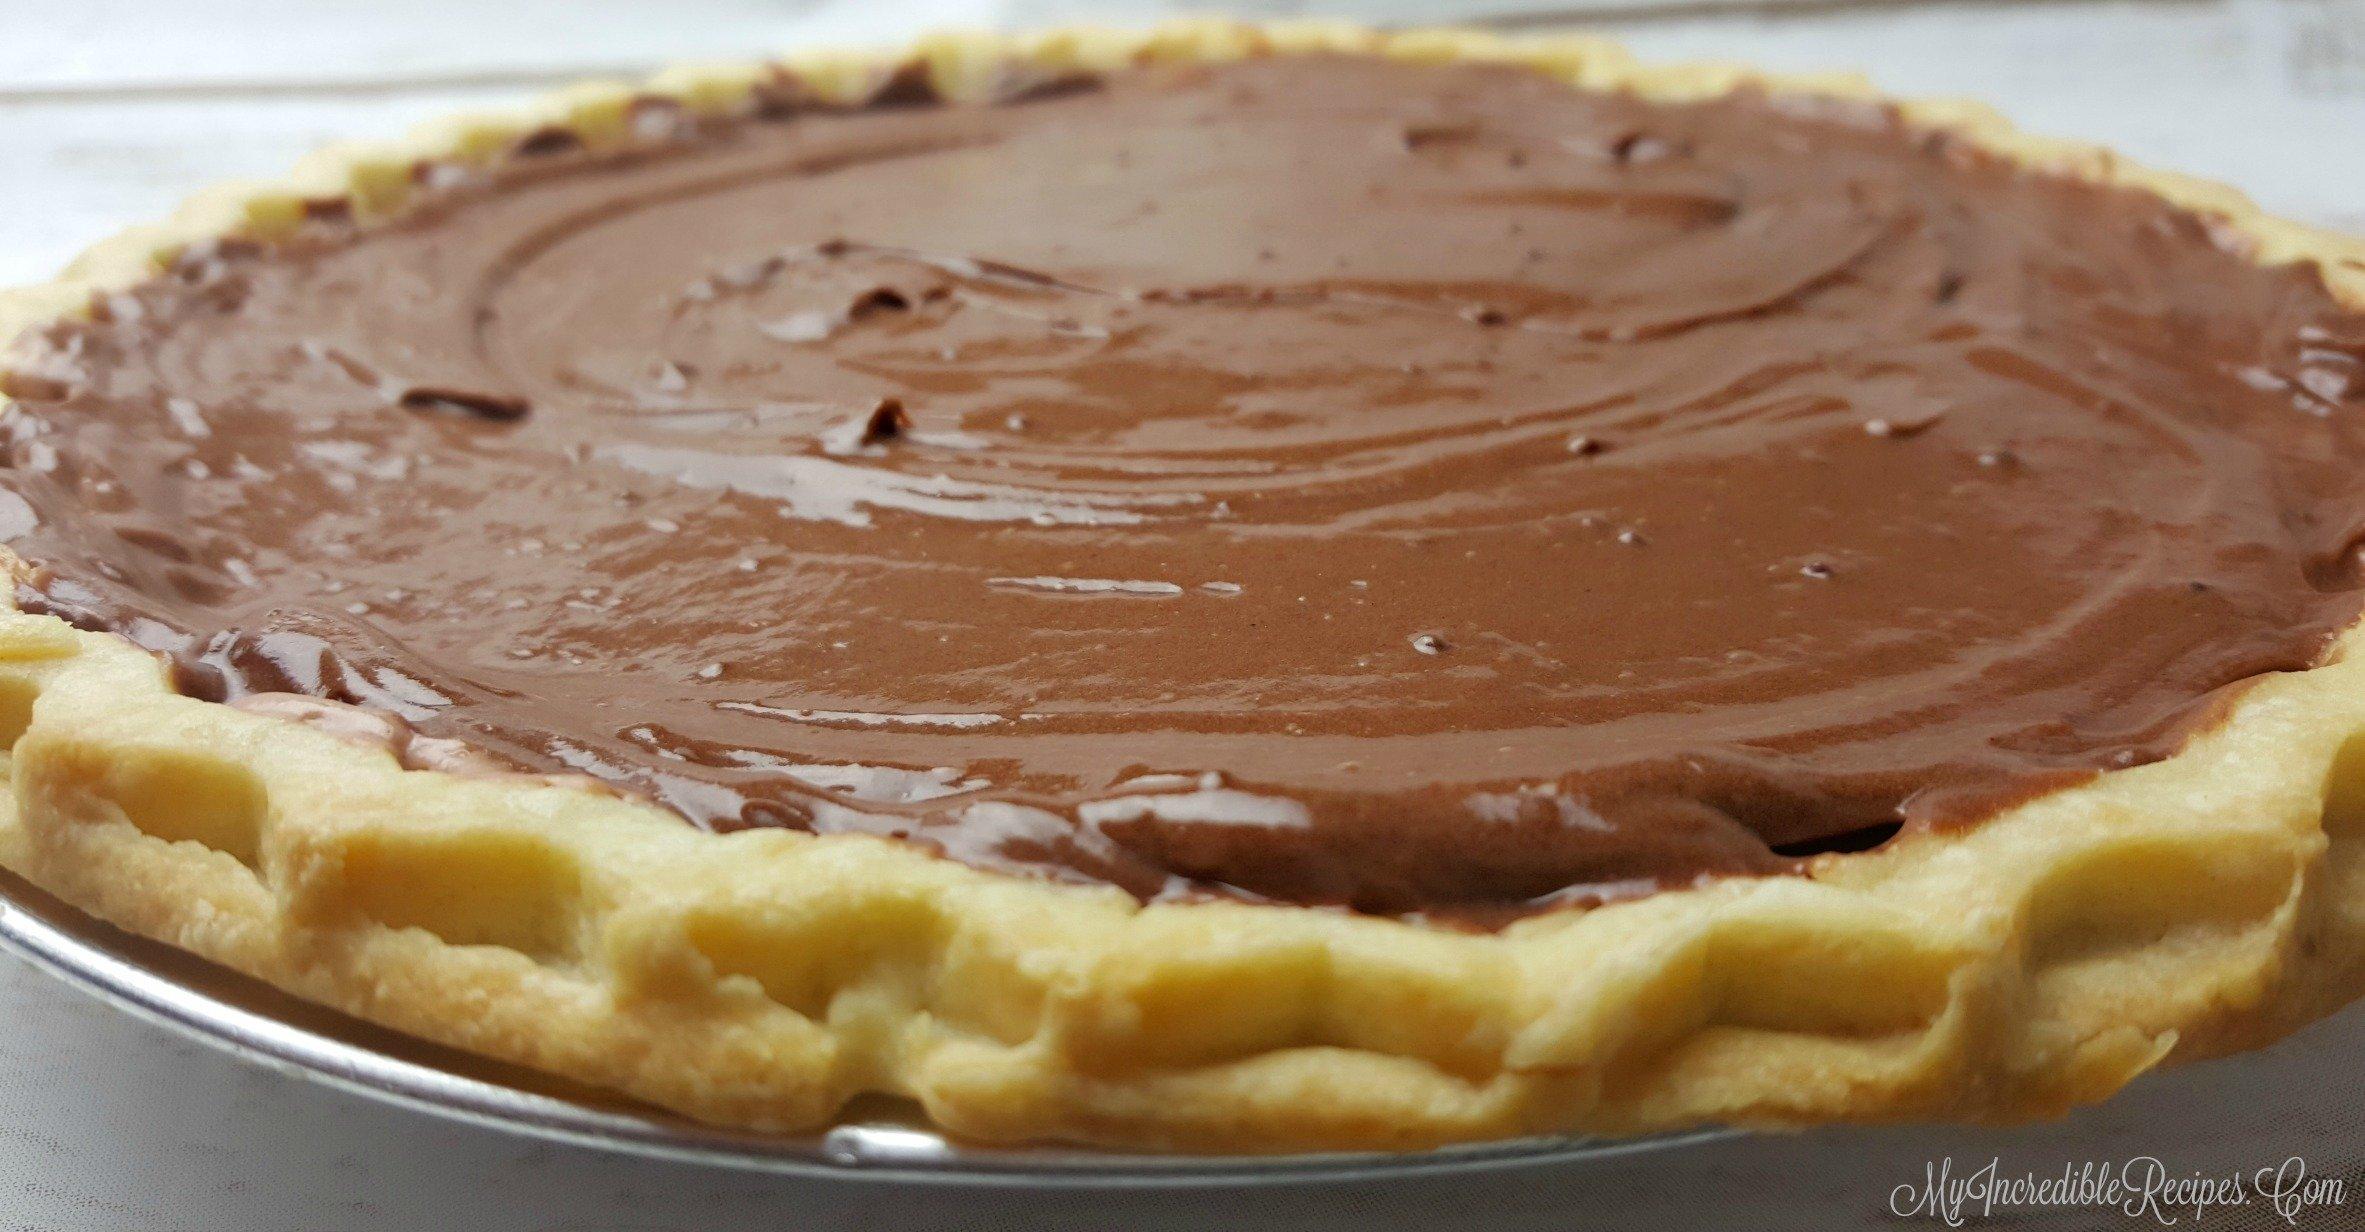 Chocolate Cream Pie!